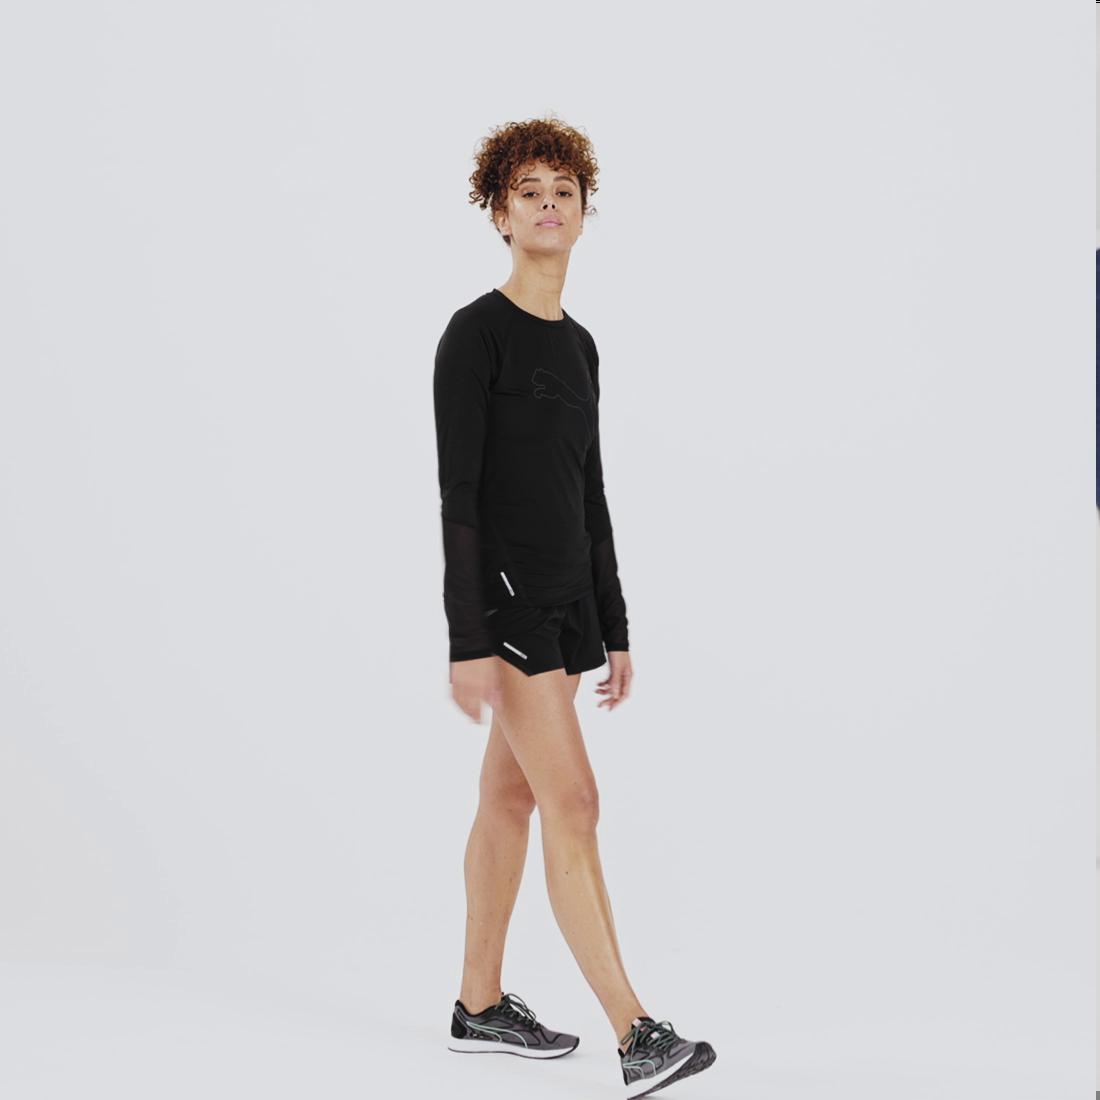 Image Puma Runner ID Long Sleeve Women's Running Tee #7